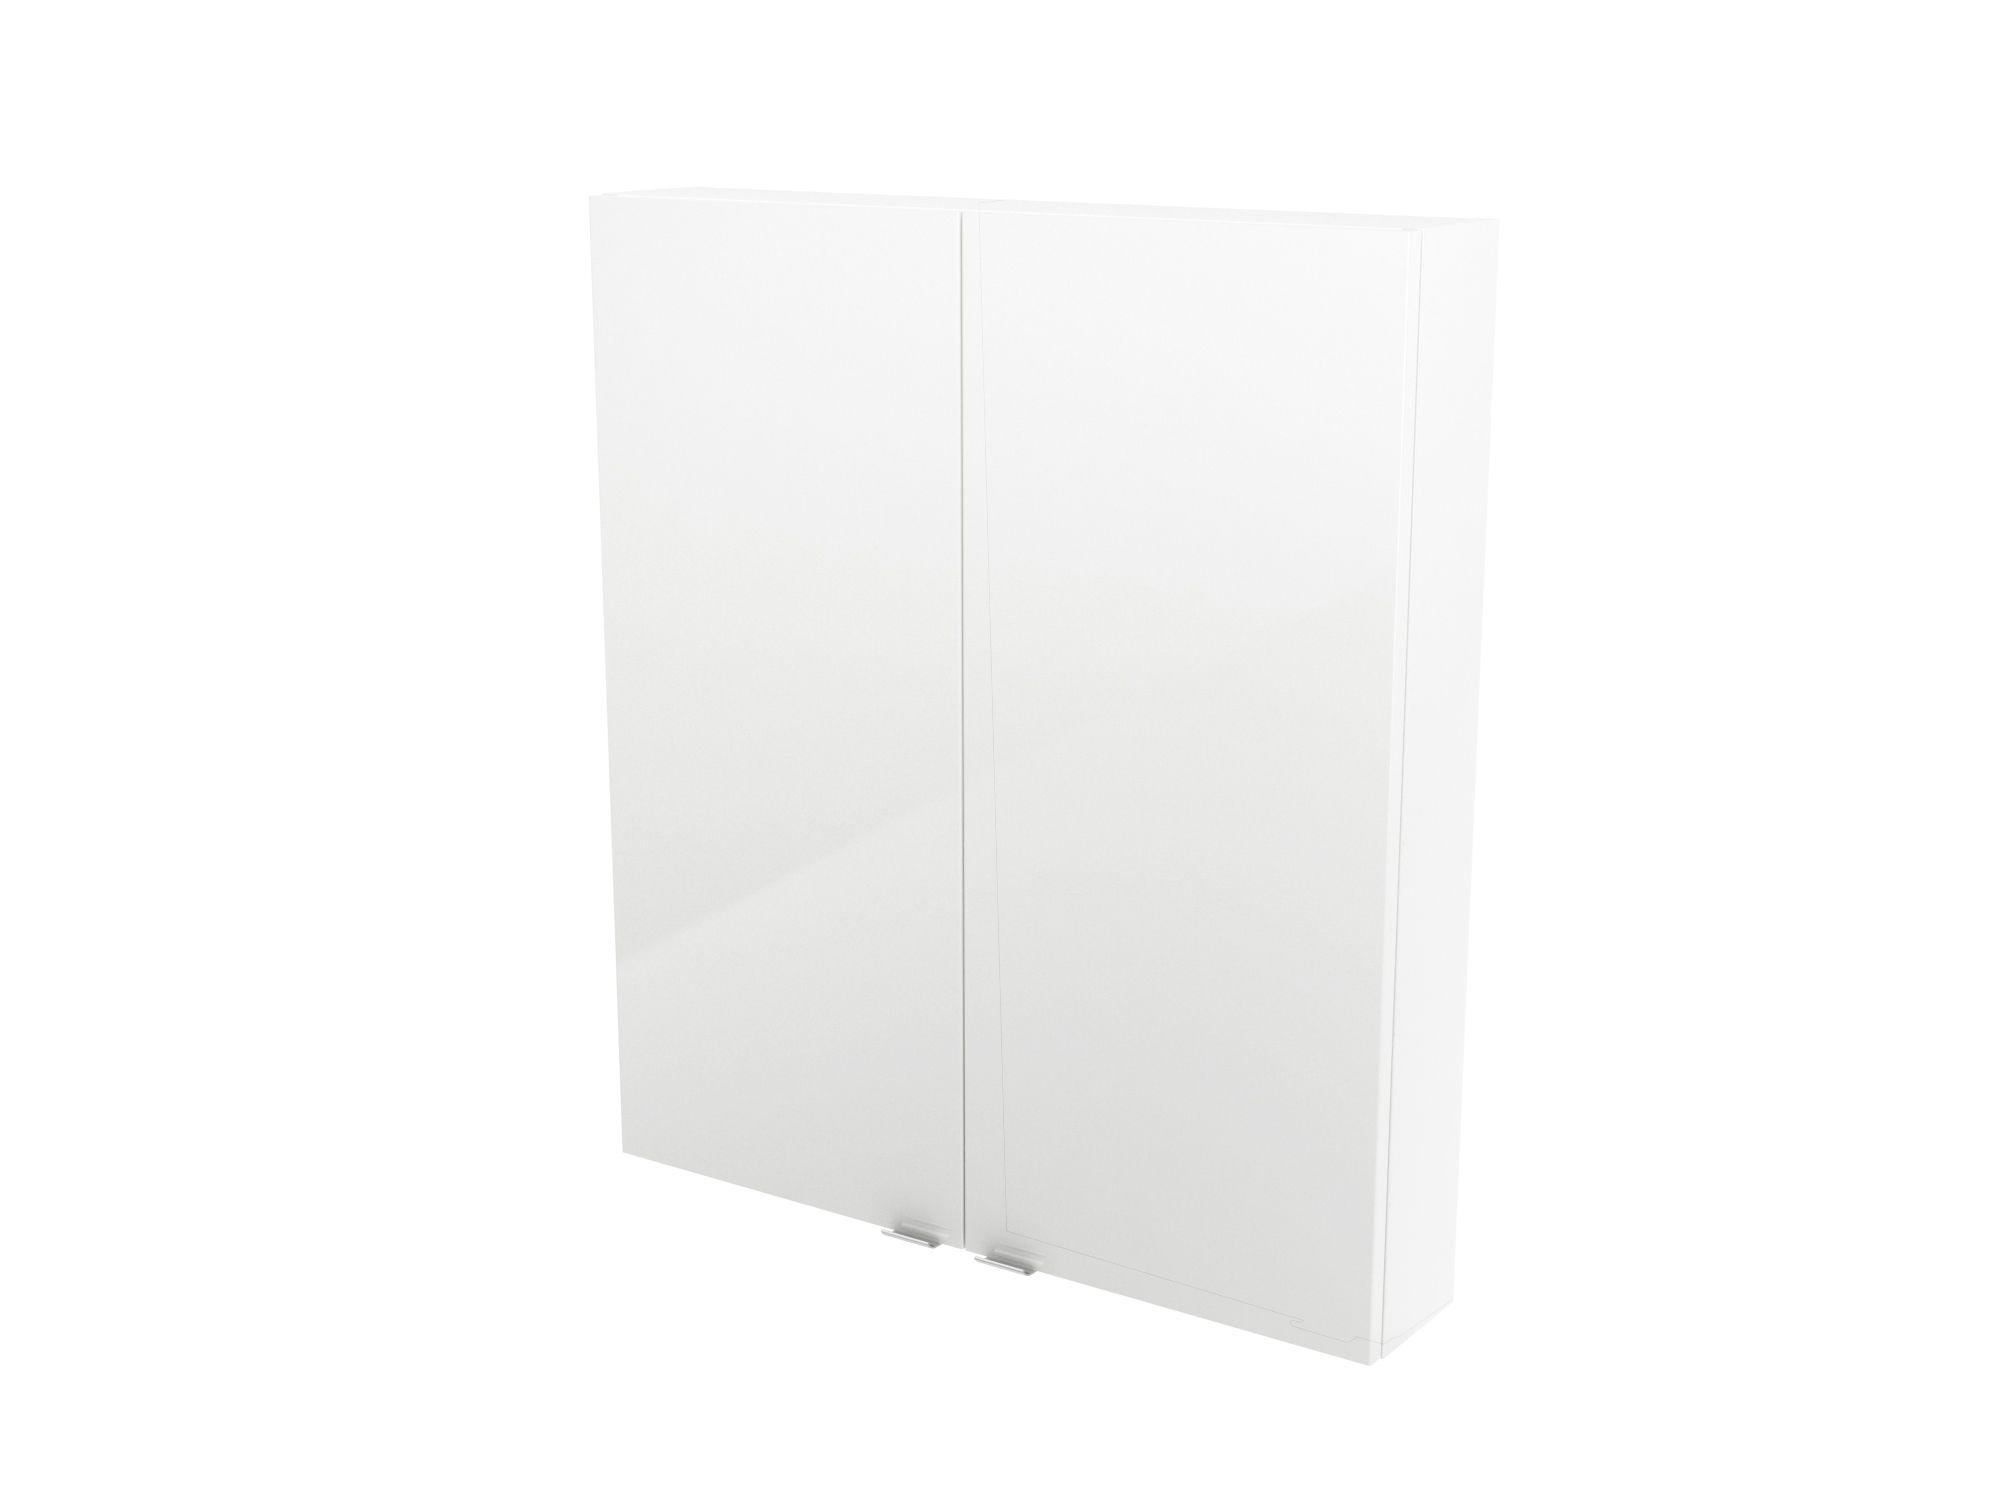 Cooke & Lewis Imandra Gloss White Wall Cabinet, (w)800mm